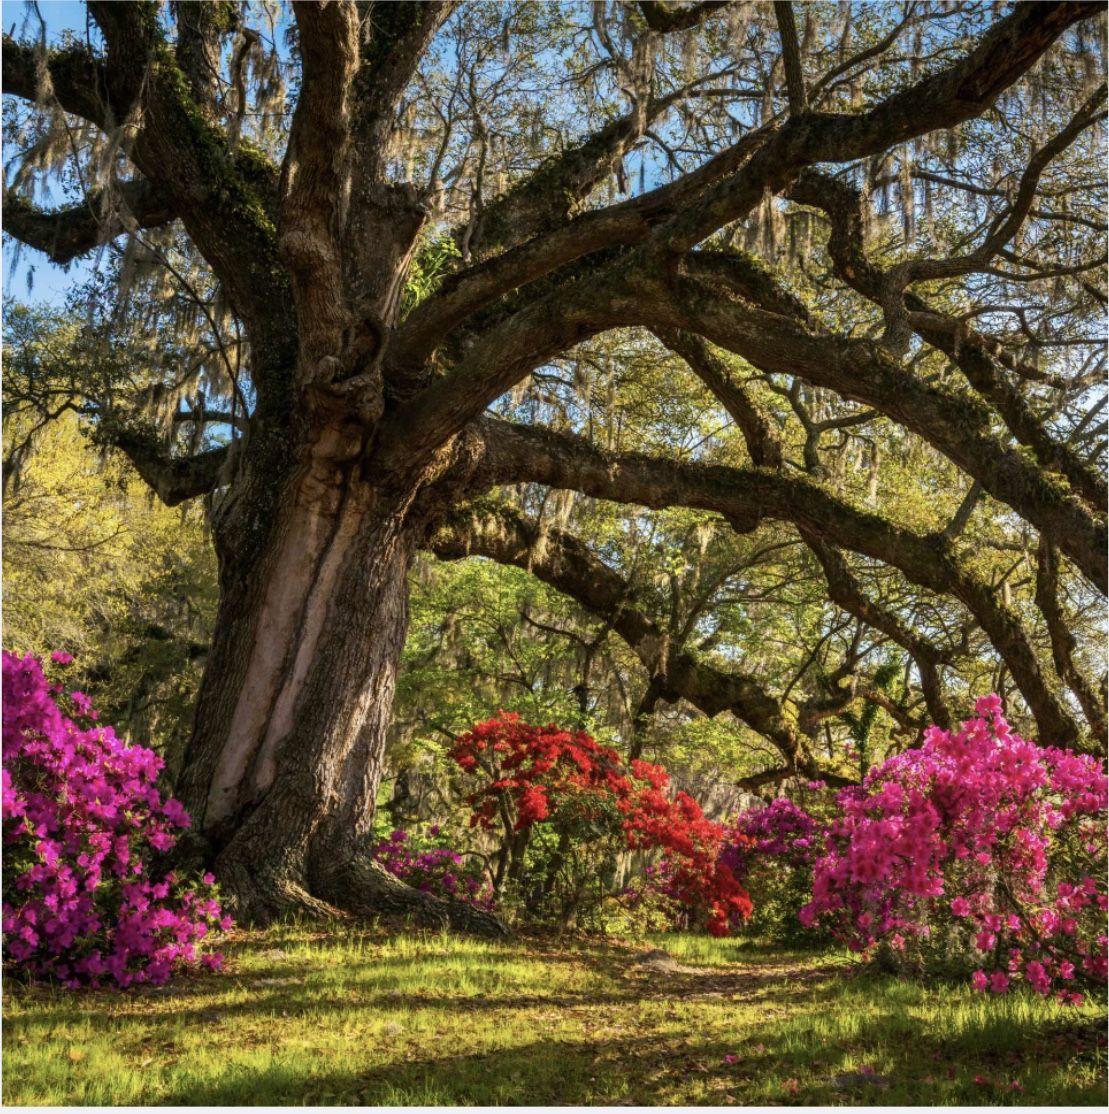 44c560014d858855c940afb9dbe7889d - Magnolia Plantation And Gardens Savannah Ga